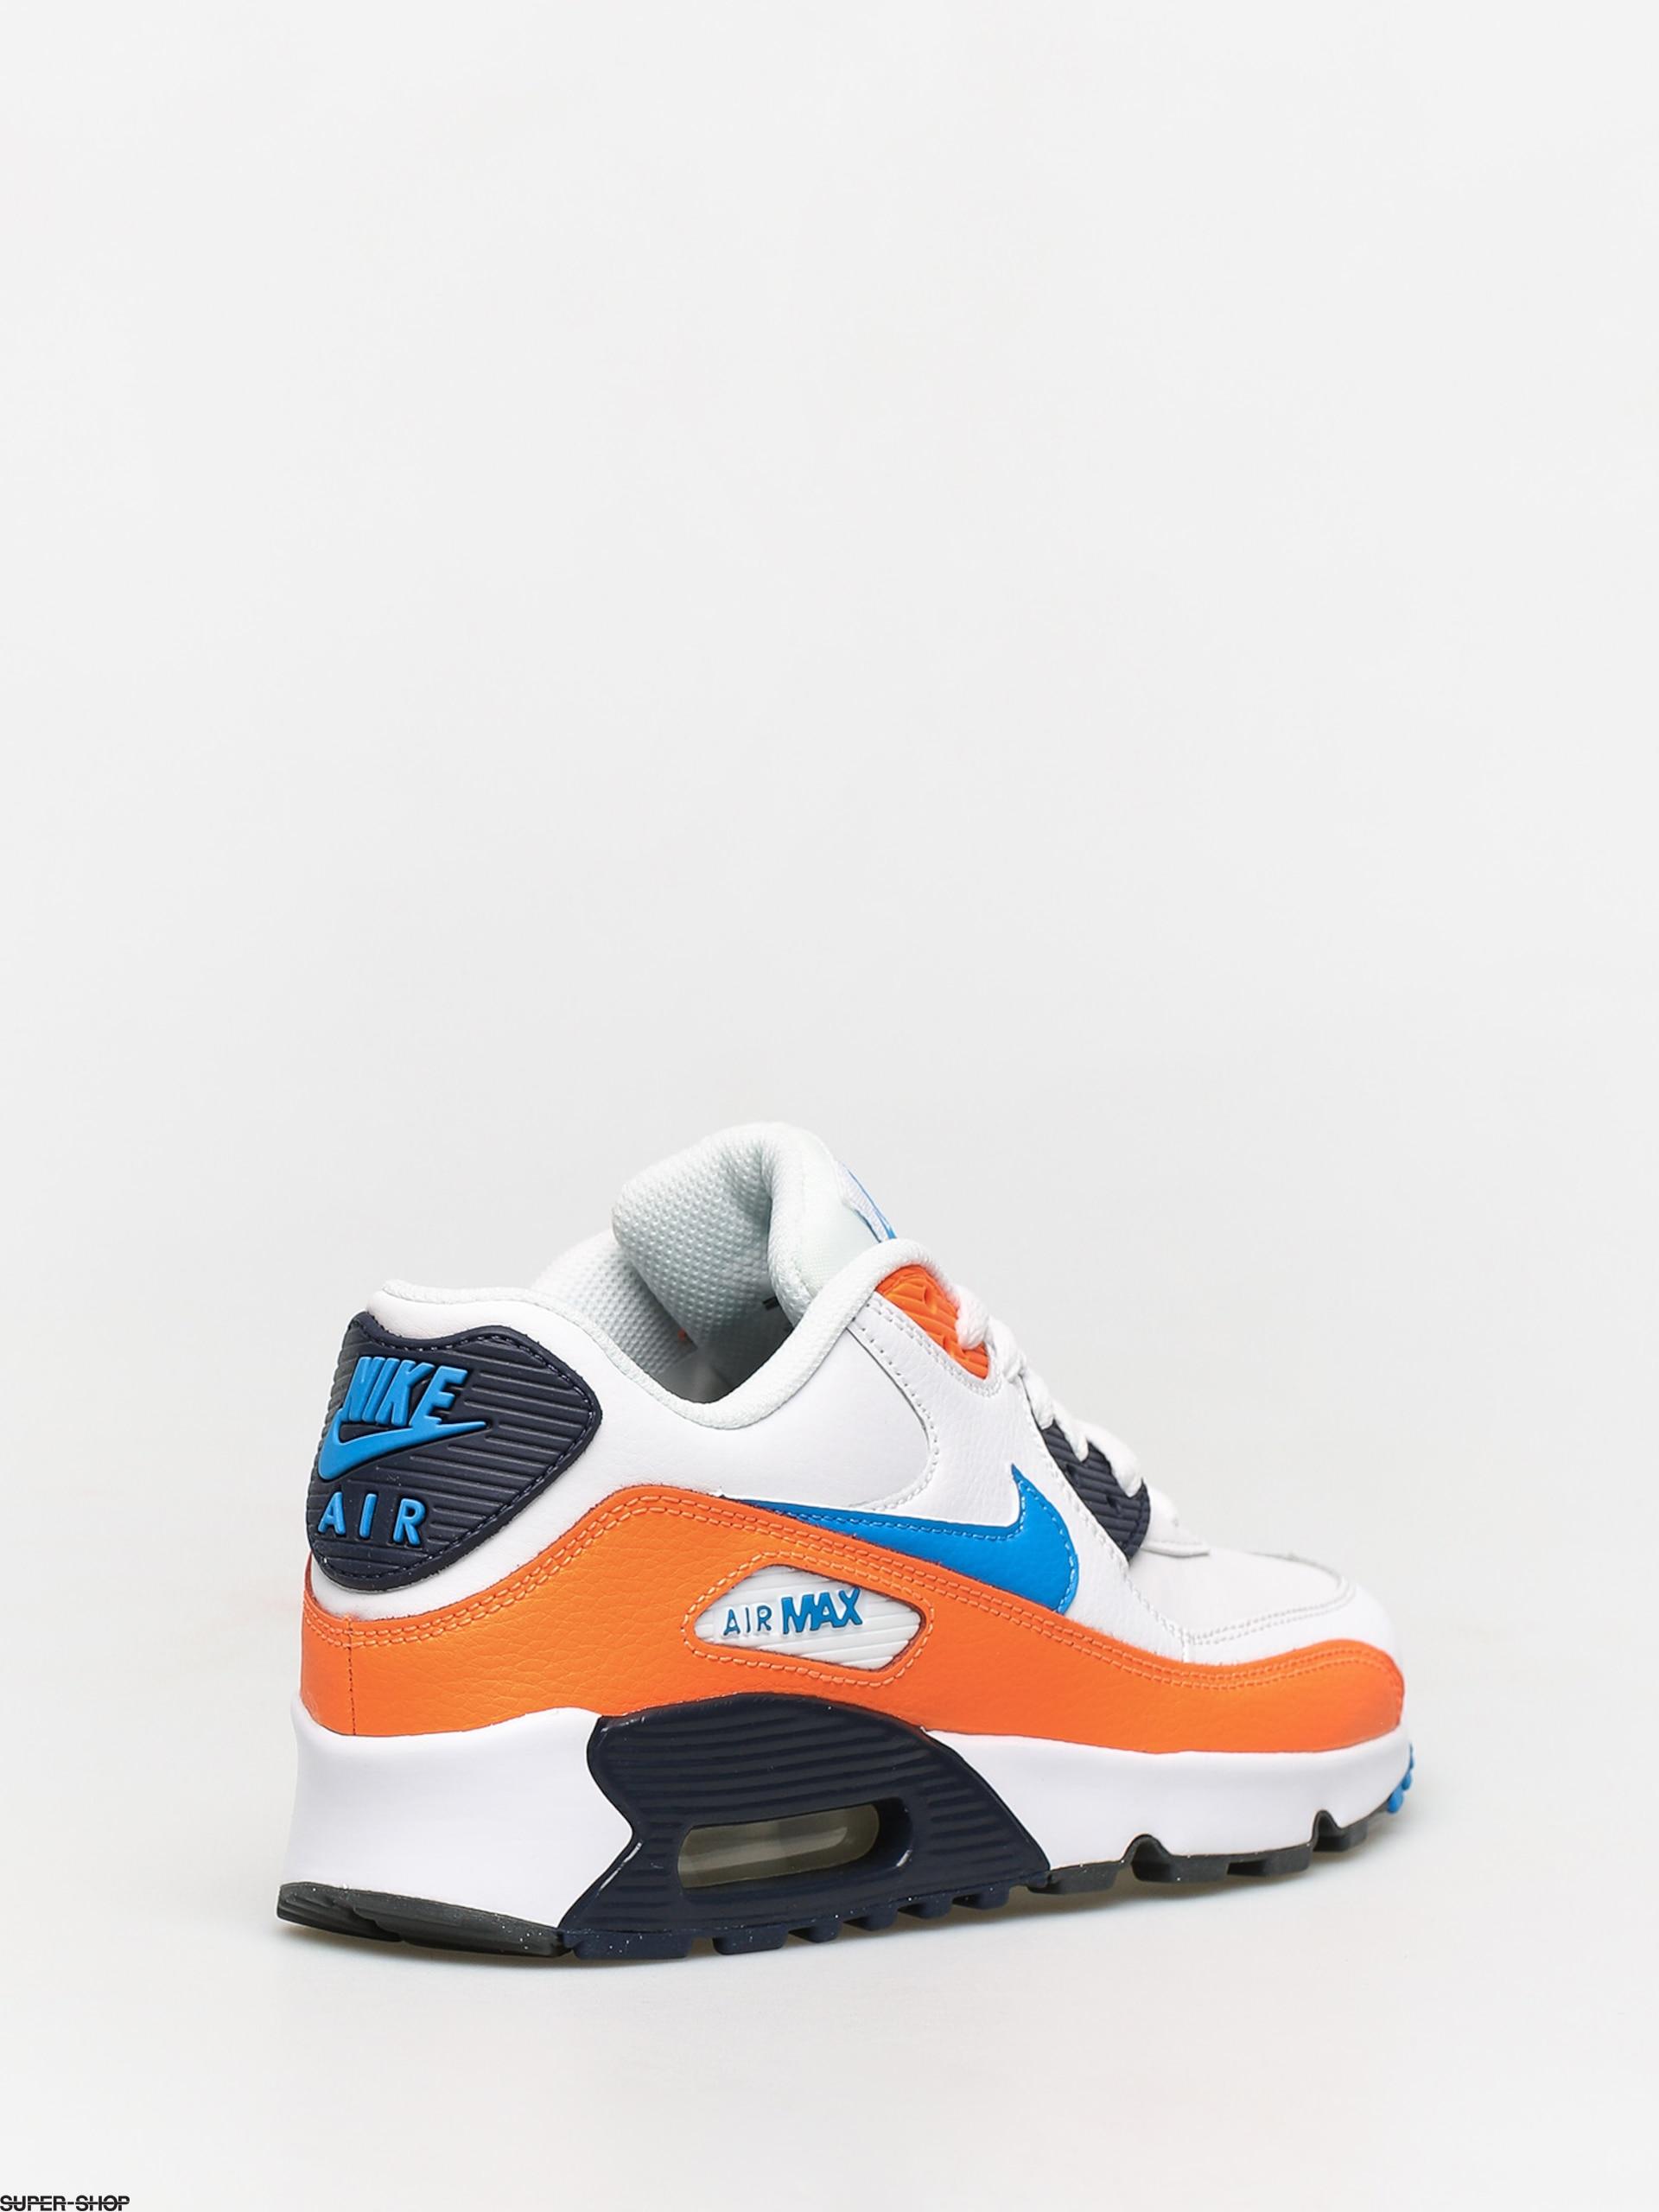 Nike Air Max 90 LTR (GS) Sneakers WhitePhoto BlueTotal Orange